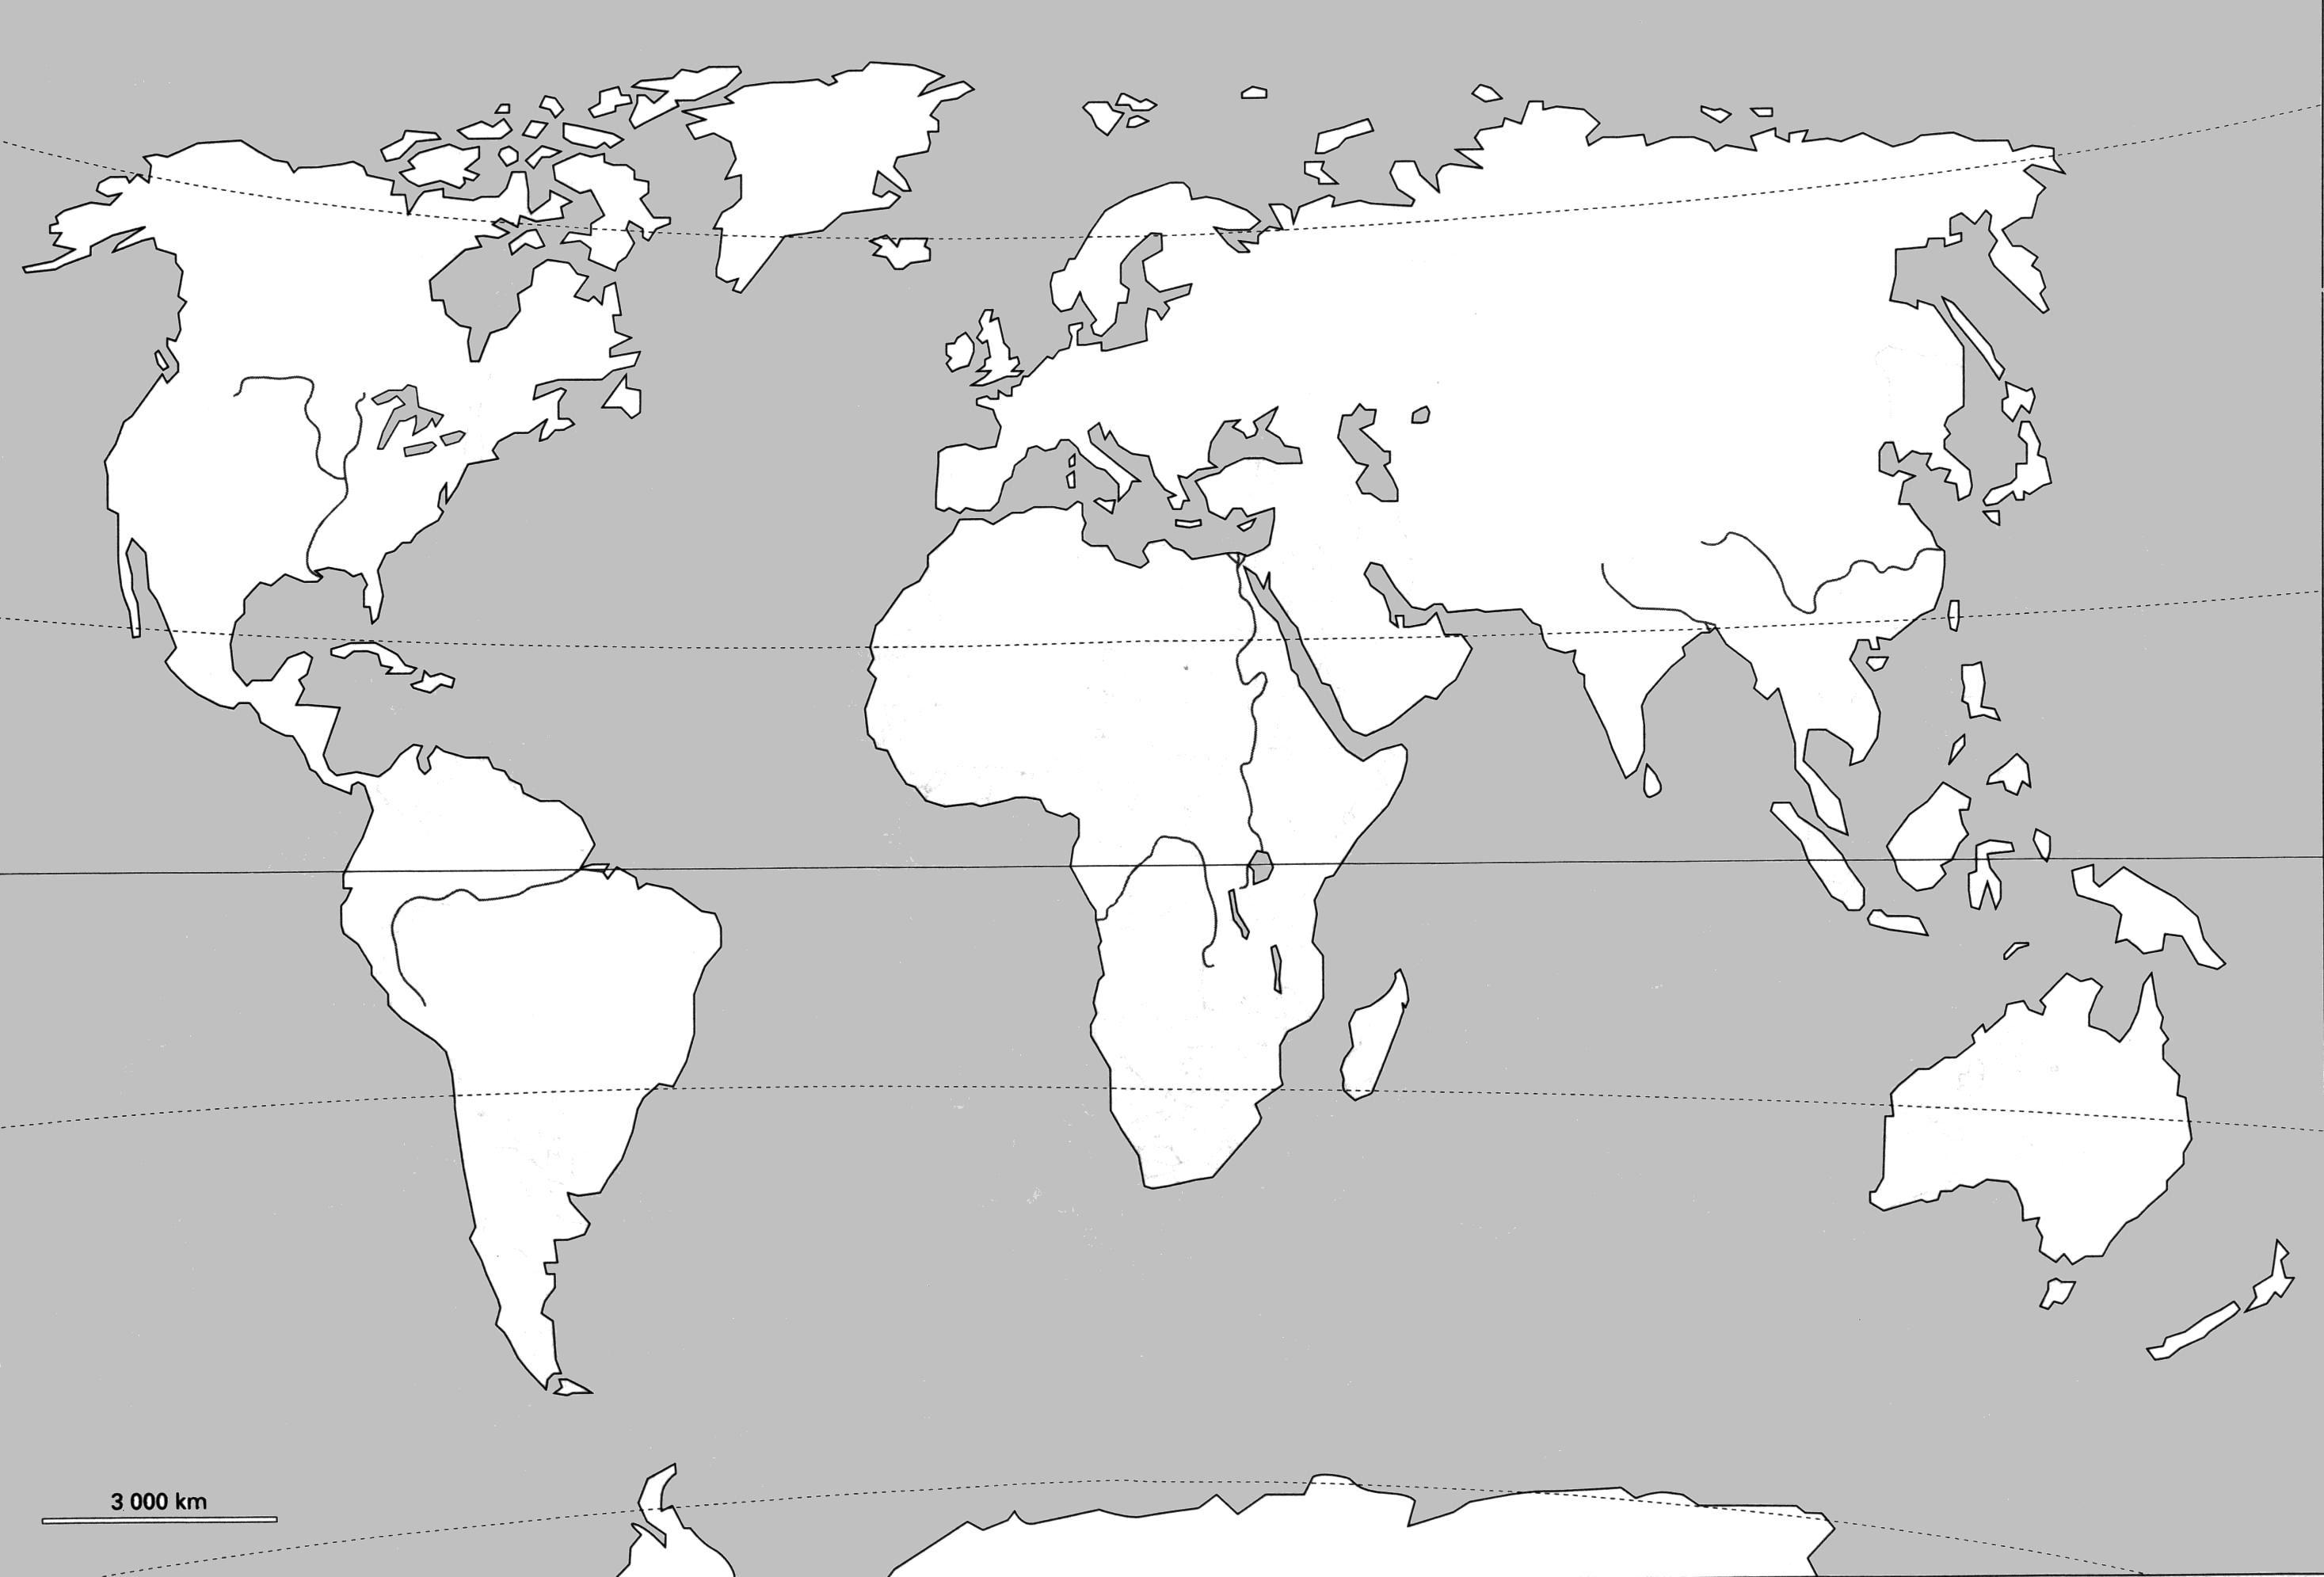 Cartograf Fr Diverses Cartes Du Monde Geographiques